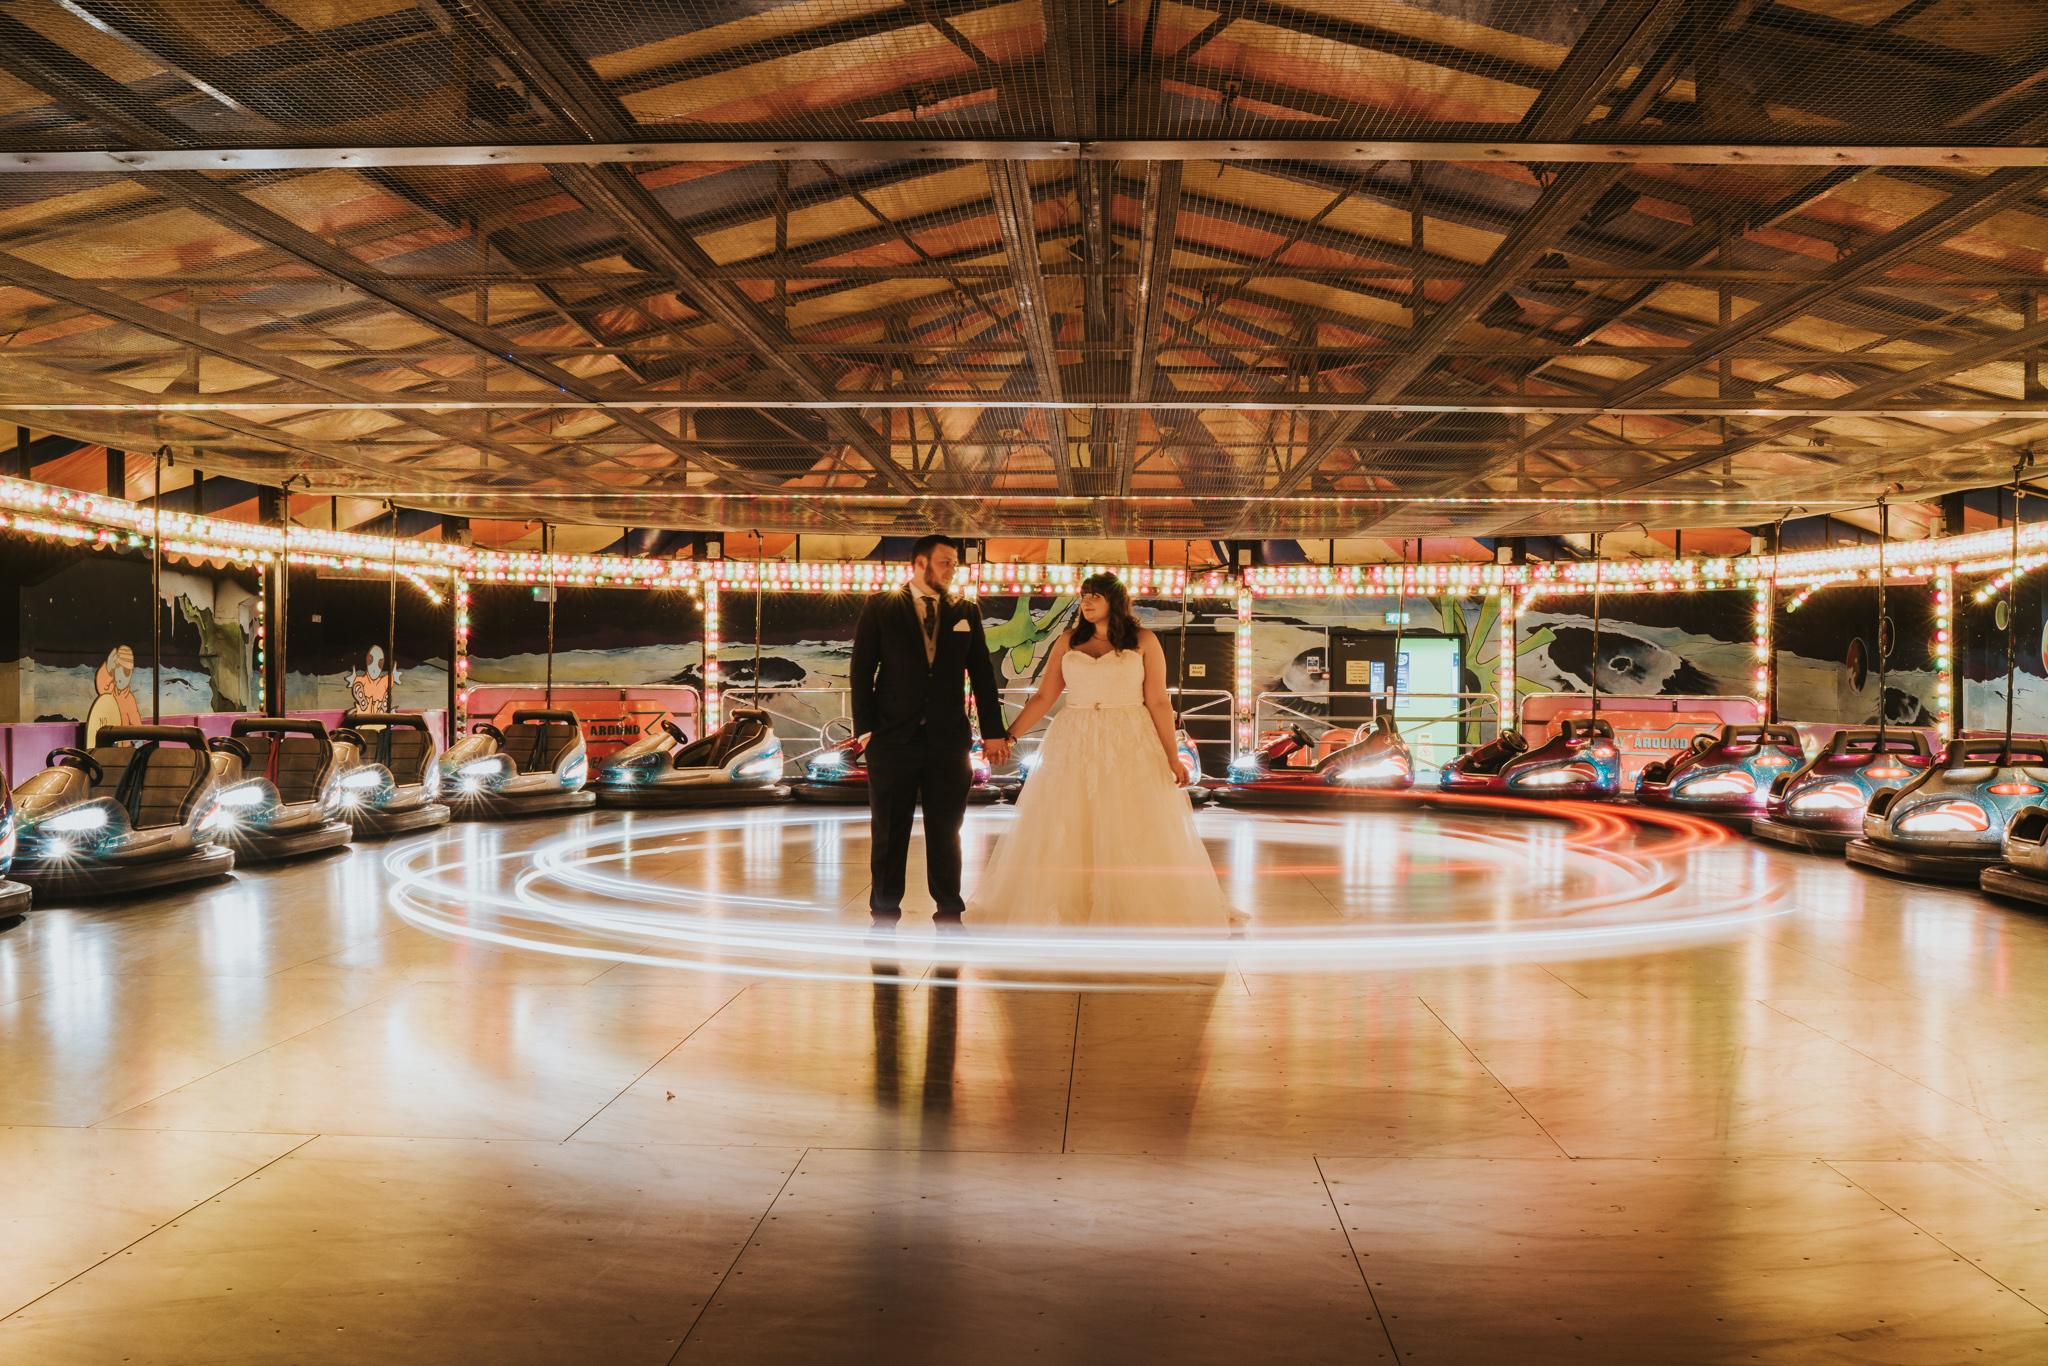 grace-sam-old-barn-clovelly-devon-wedding-photographer-grace-elizabeth-essex-suffolk-norfolk-wedding-photographer (104 of 132).jpg